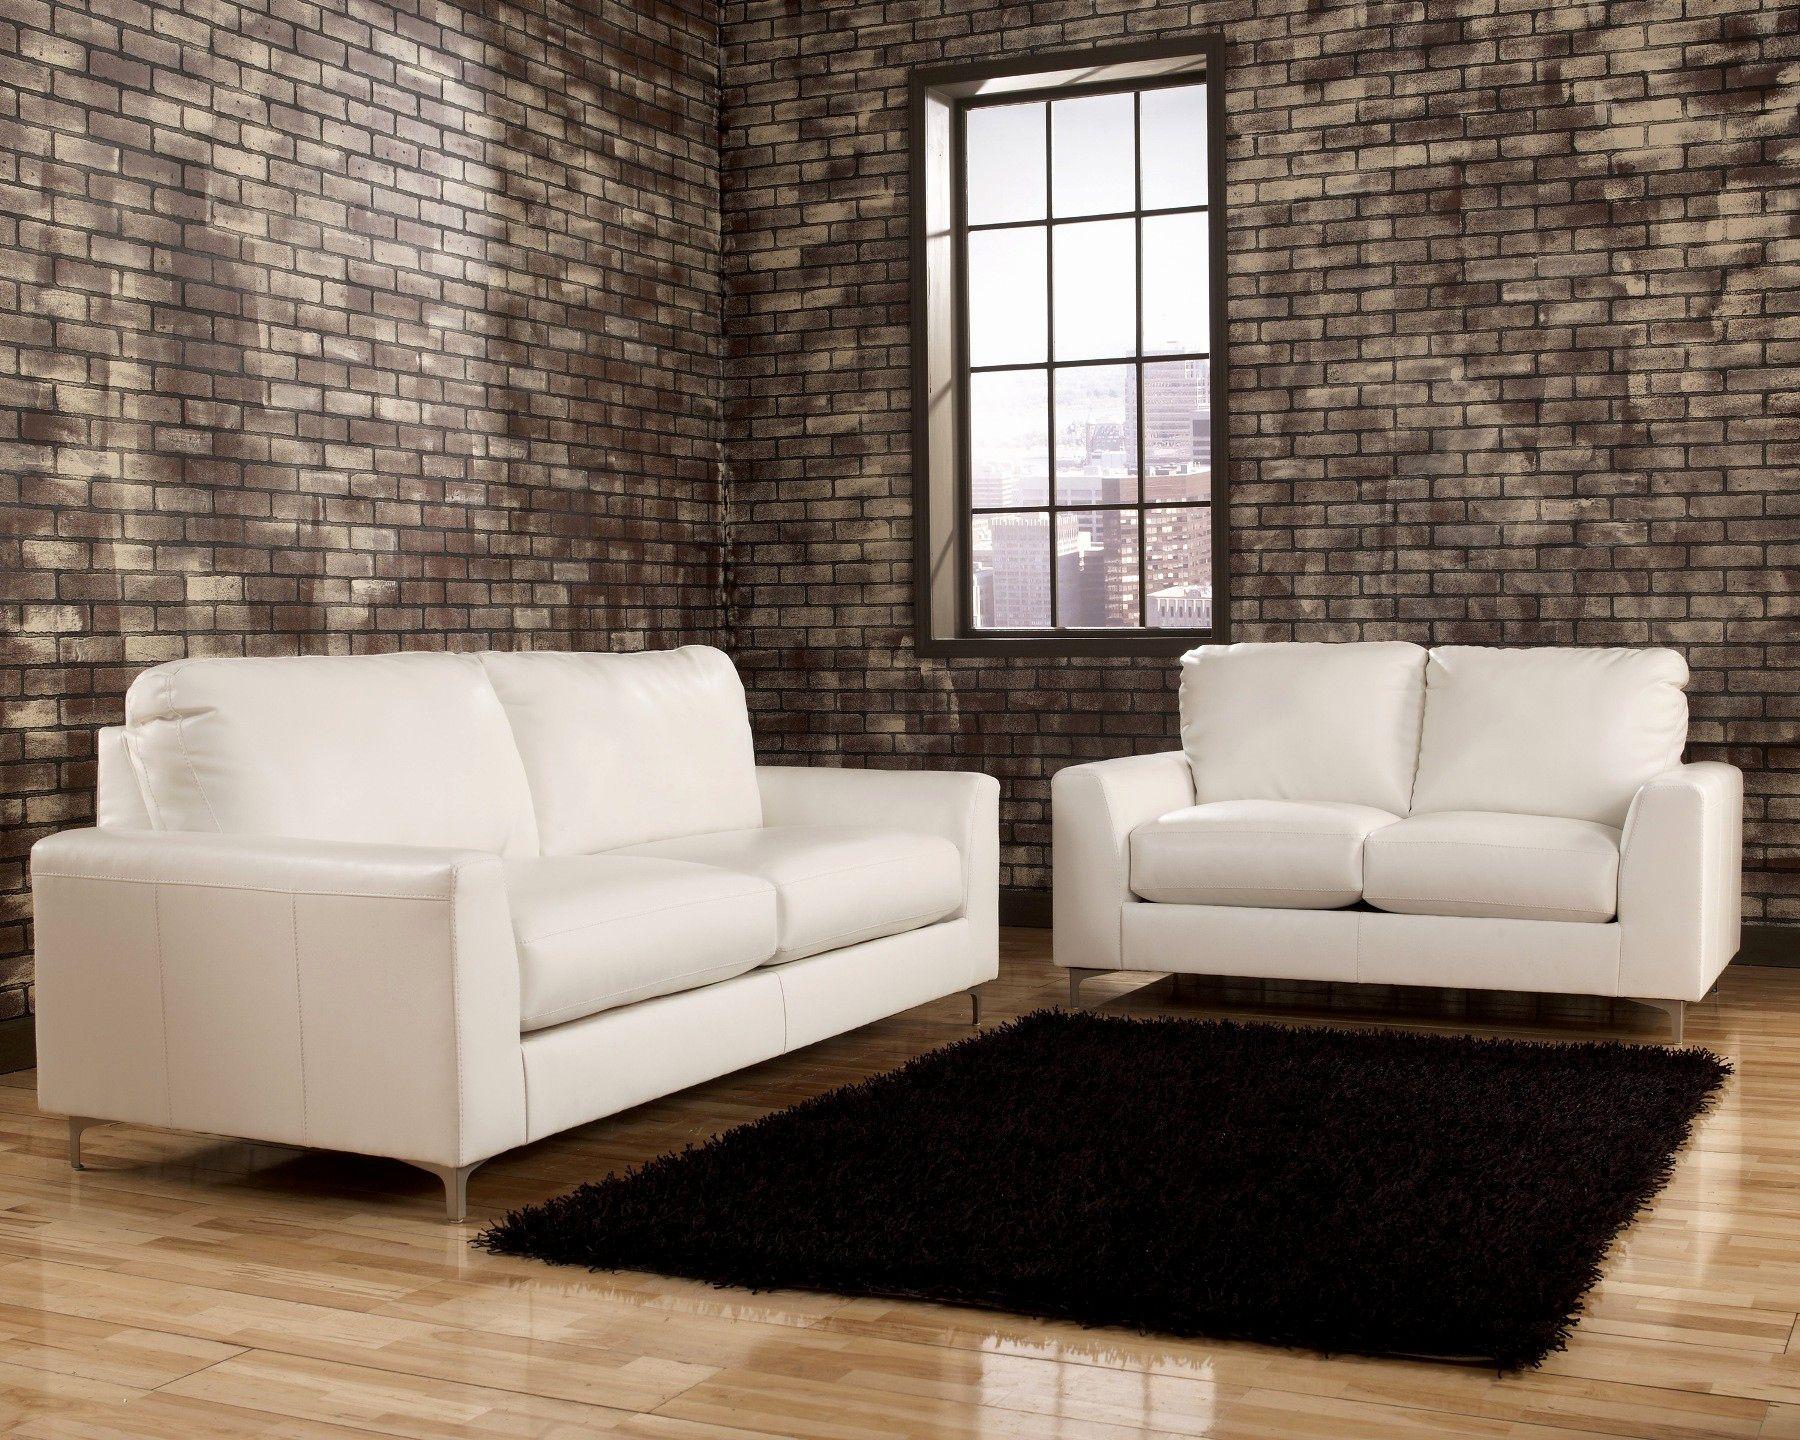 ashley furniture modern sofa robert michael balboa best of photographs unique dazzling design living room miami all dining